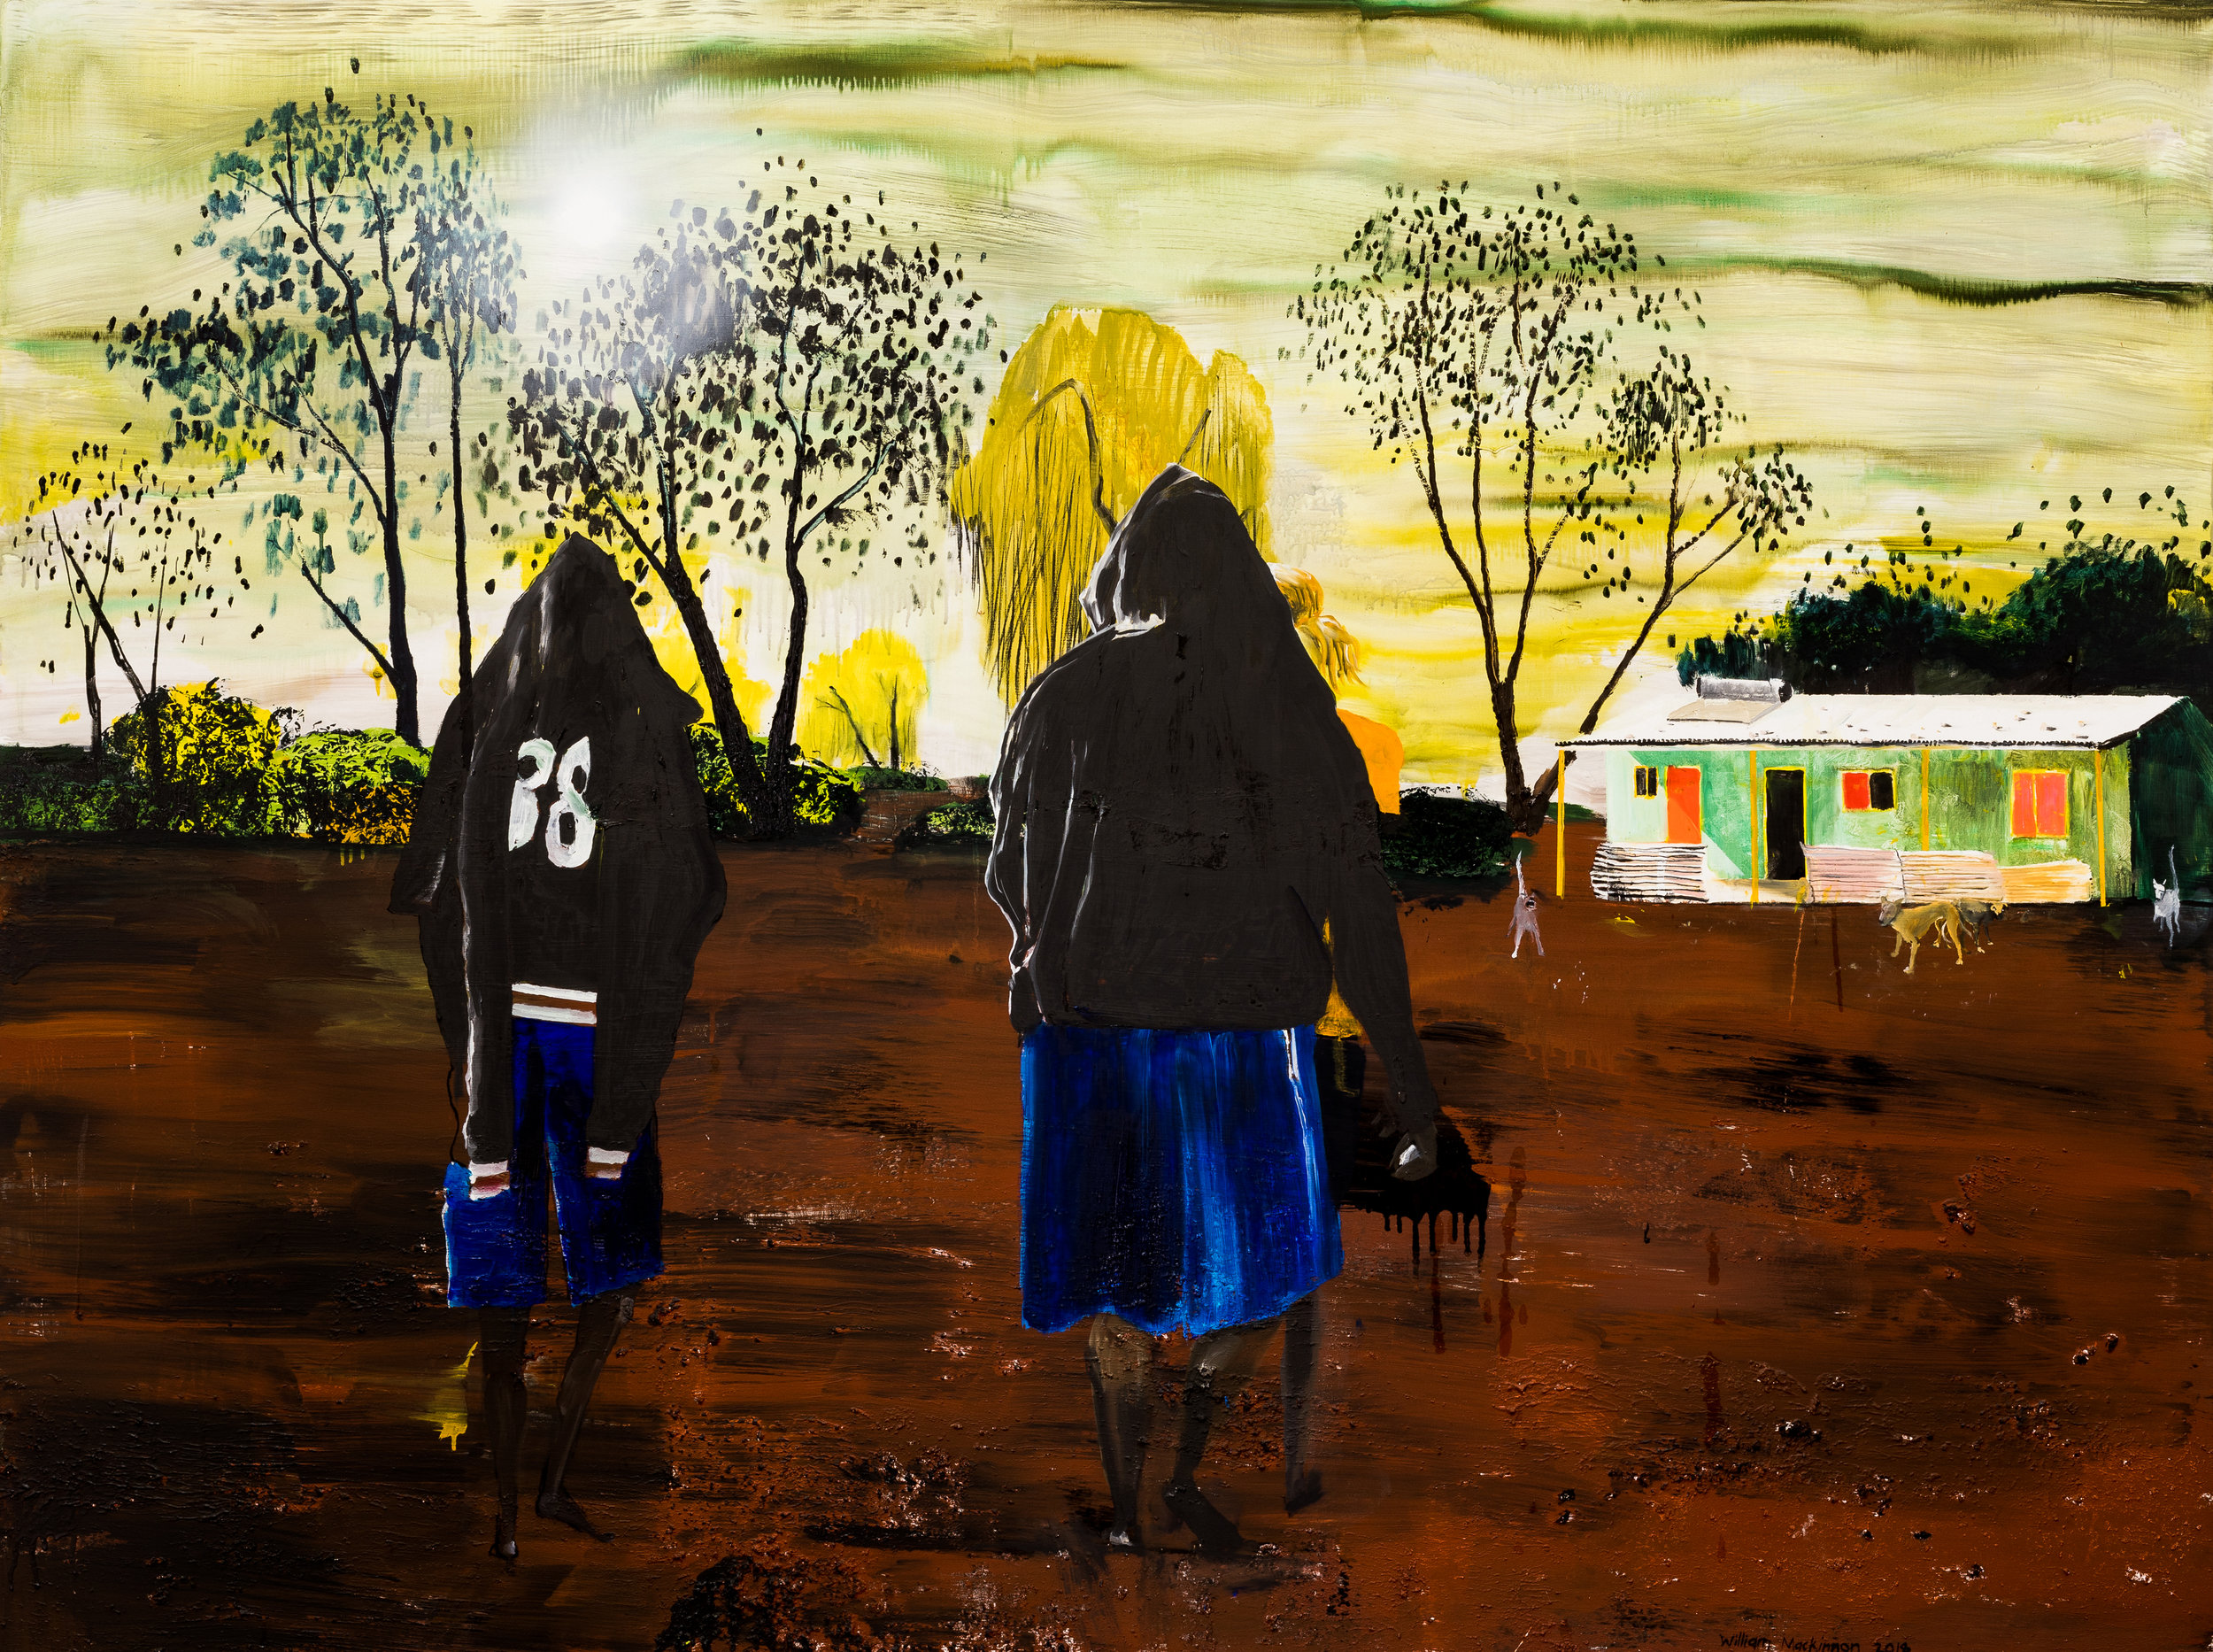 Memories of Kiwikurra.  Acrylic, oil and enamel on linen. 150 x 200 cm 2018